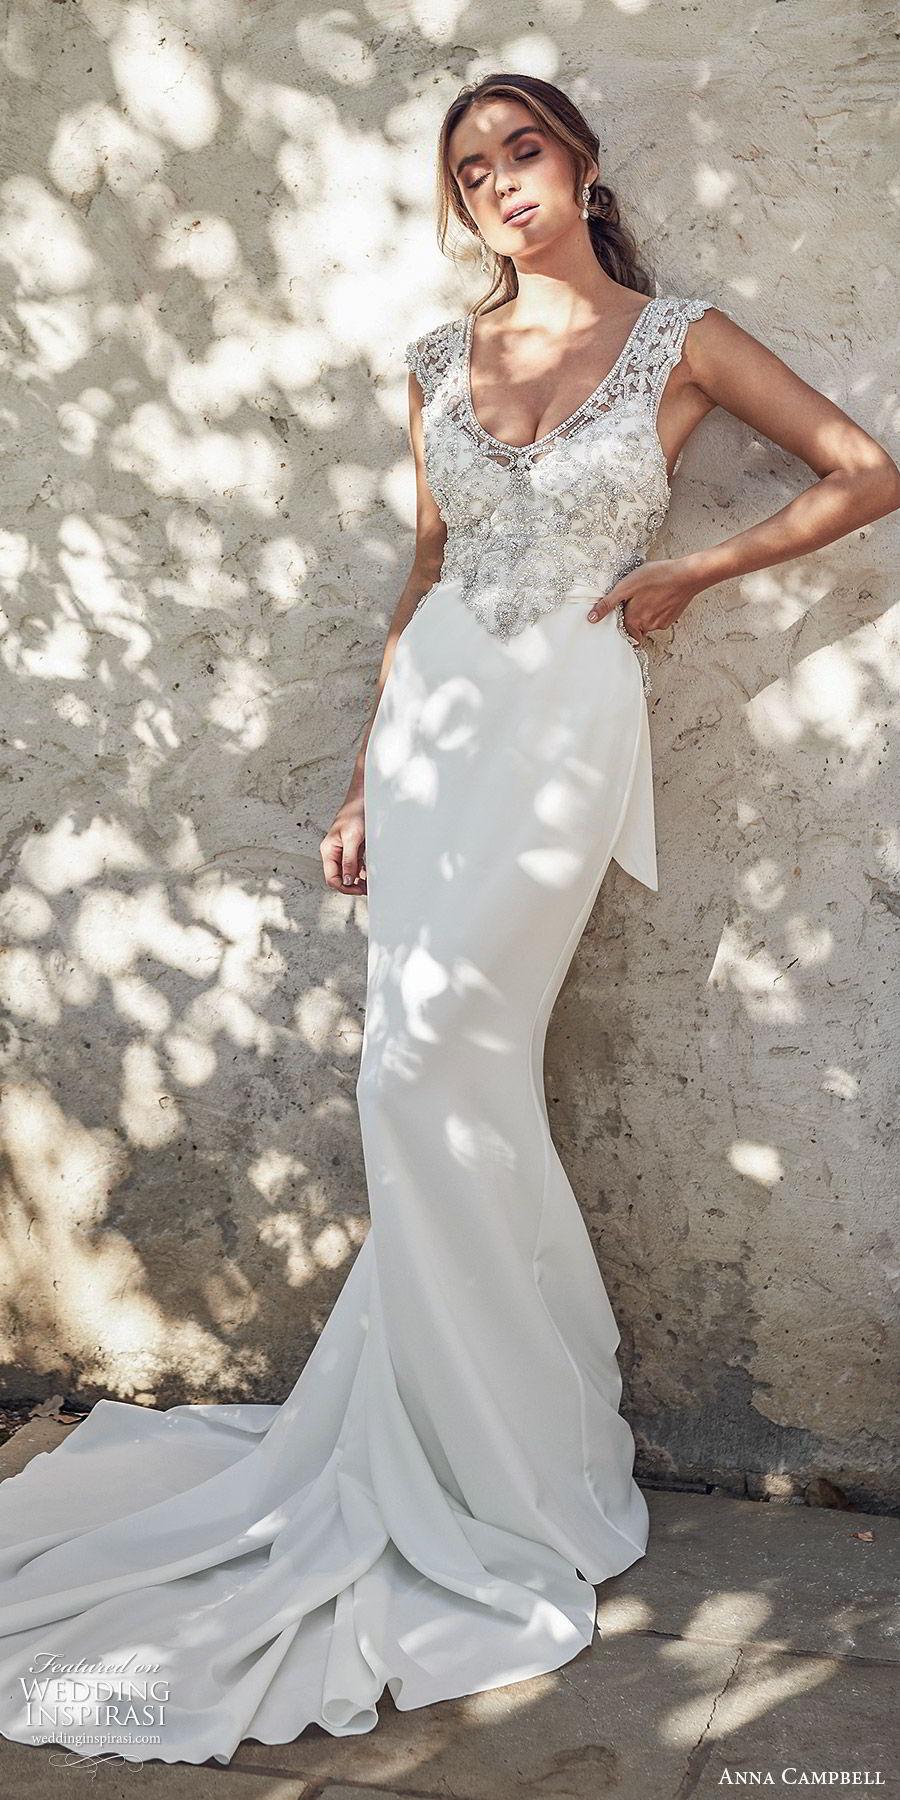 anna campbell 2020 bridal illusion cap sleeves scoop neck heavily embellished bodice trumpet mermaid sheath wedding dress (3) glitzy glam v back chapel train mv